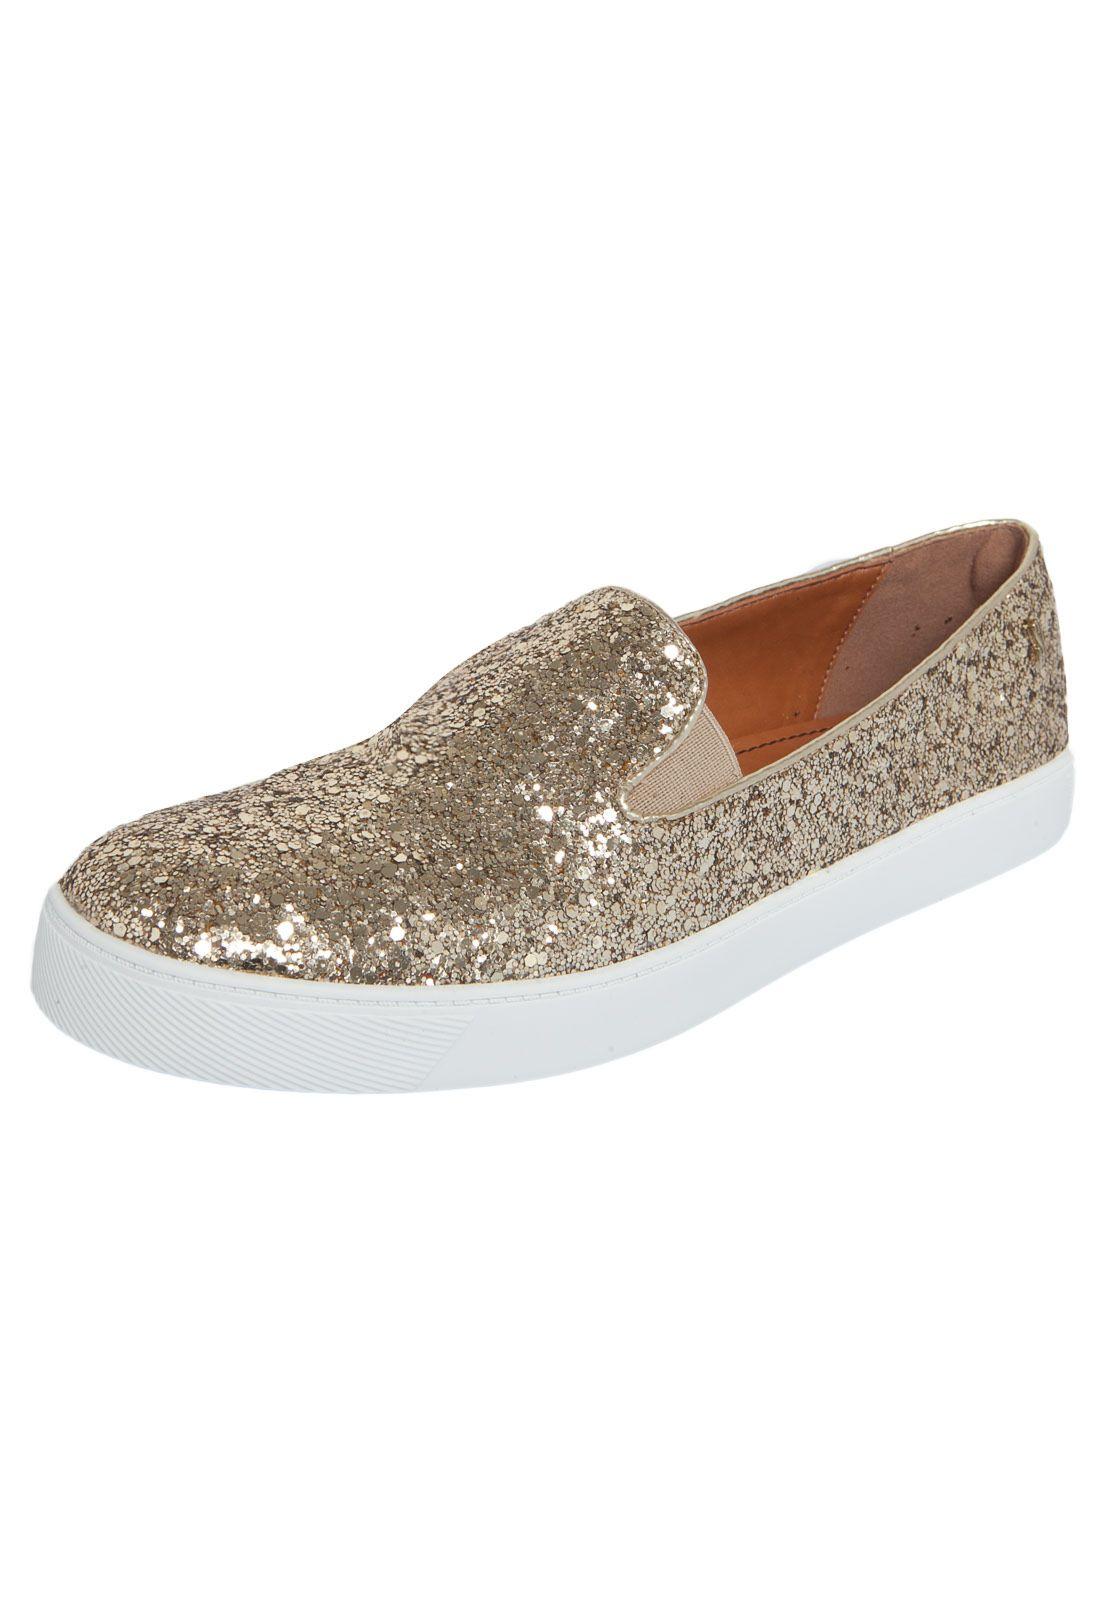 bb3521f32 Tênis Slip On Santa Lolla Glitter Dourado - Compre Agora